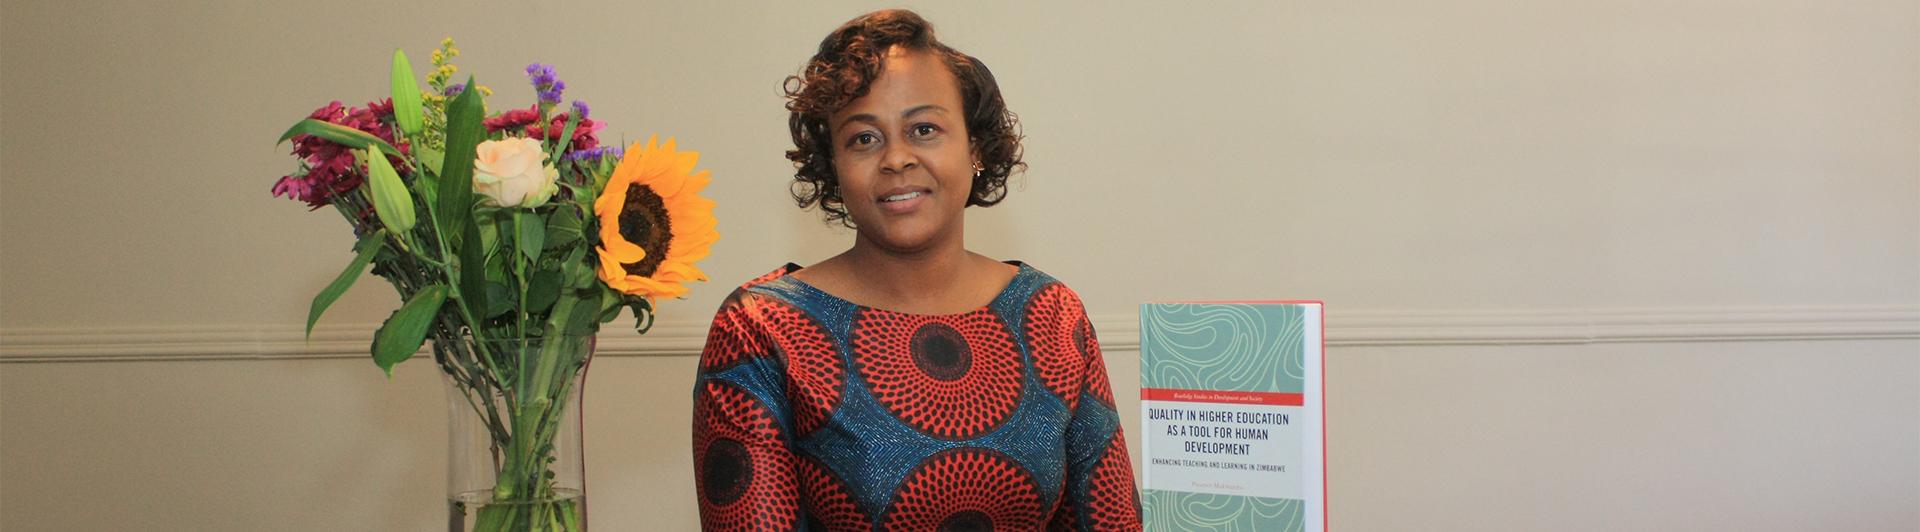 Dr Patience Mukwambo